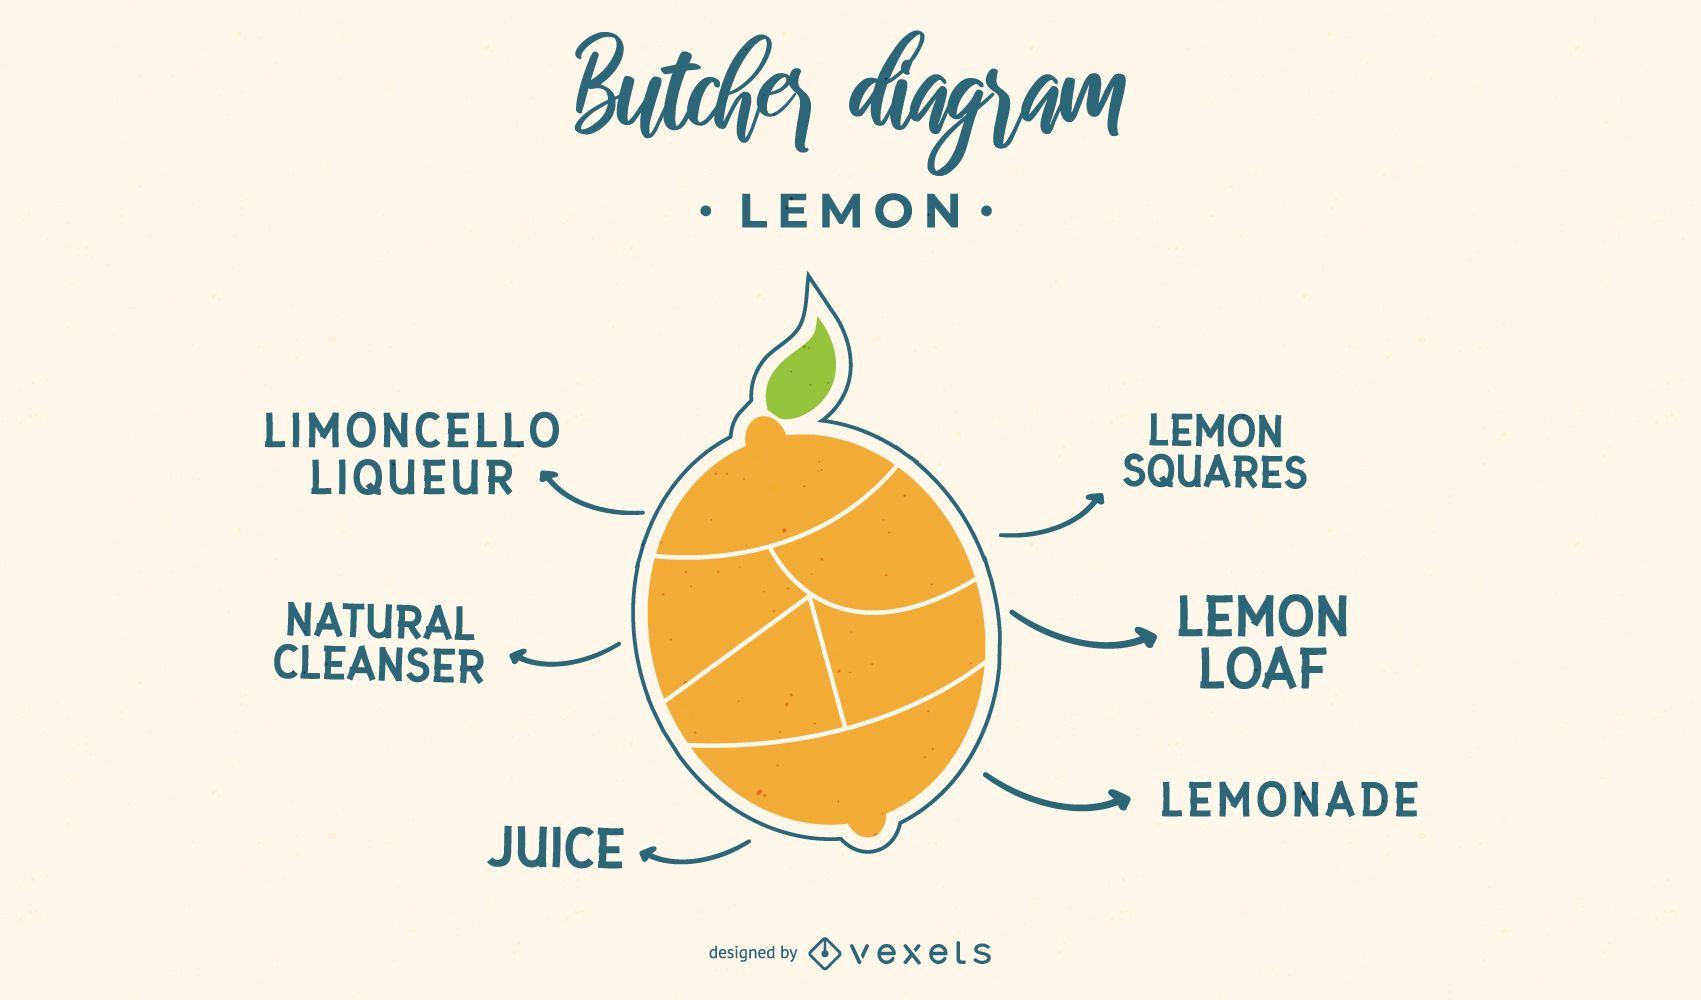 Lemon Butcher Diagram